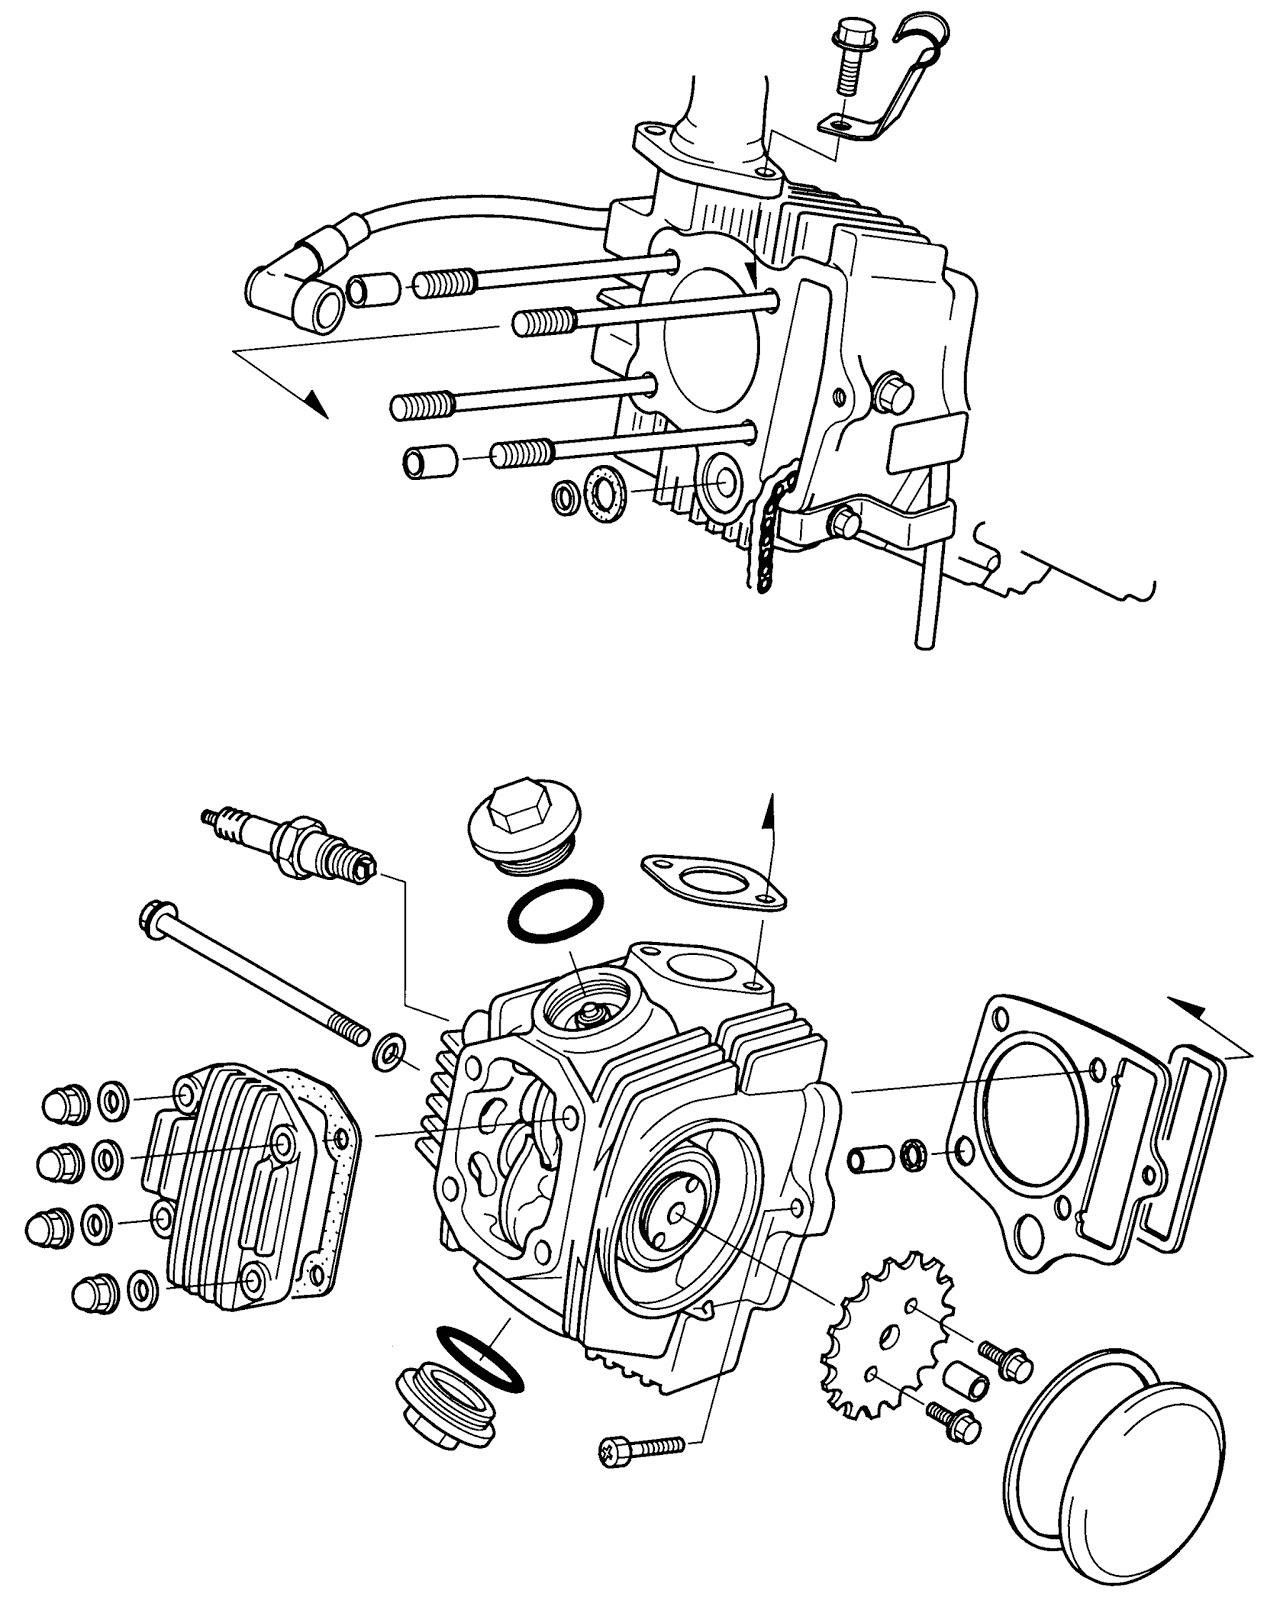 125cc Roketa Dirt Bike Wiring Diagram likewise 2004 Chevy Colorado Stereo Wiring Diagram besides 1997 Saab 900 Wiring Diagram additionally Volvo 740 Radio Wiring I205052950 in addition 88 Nissan D21 Wiring Diagram. on volvo 240 stereo wiring harness